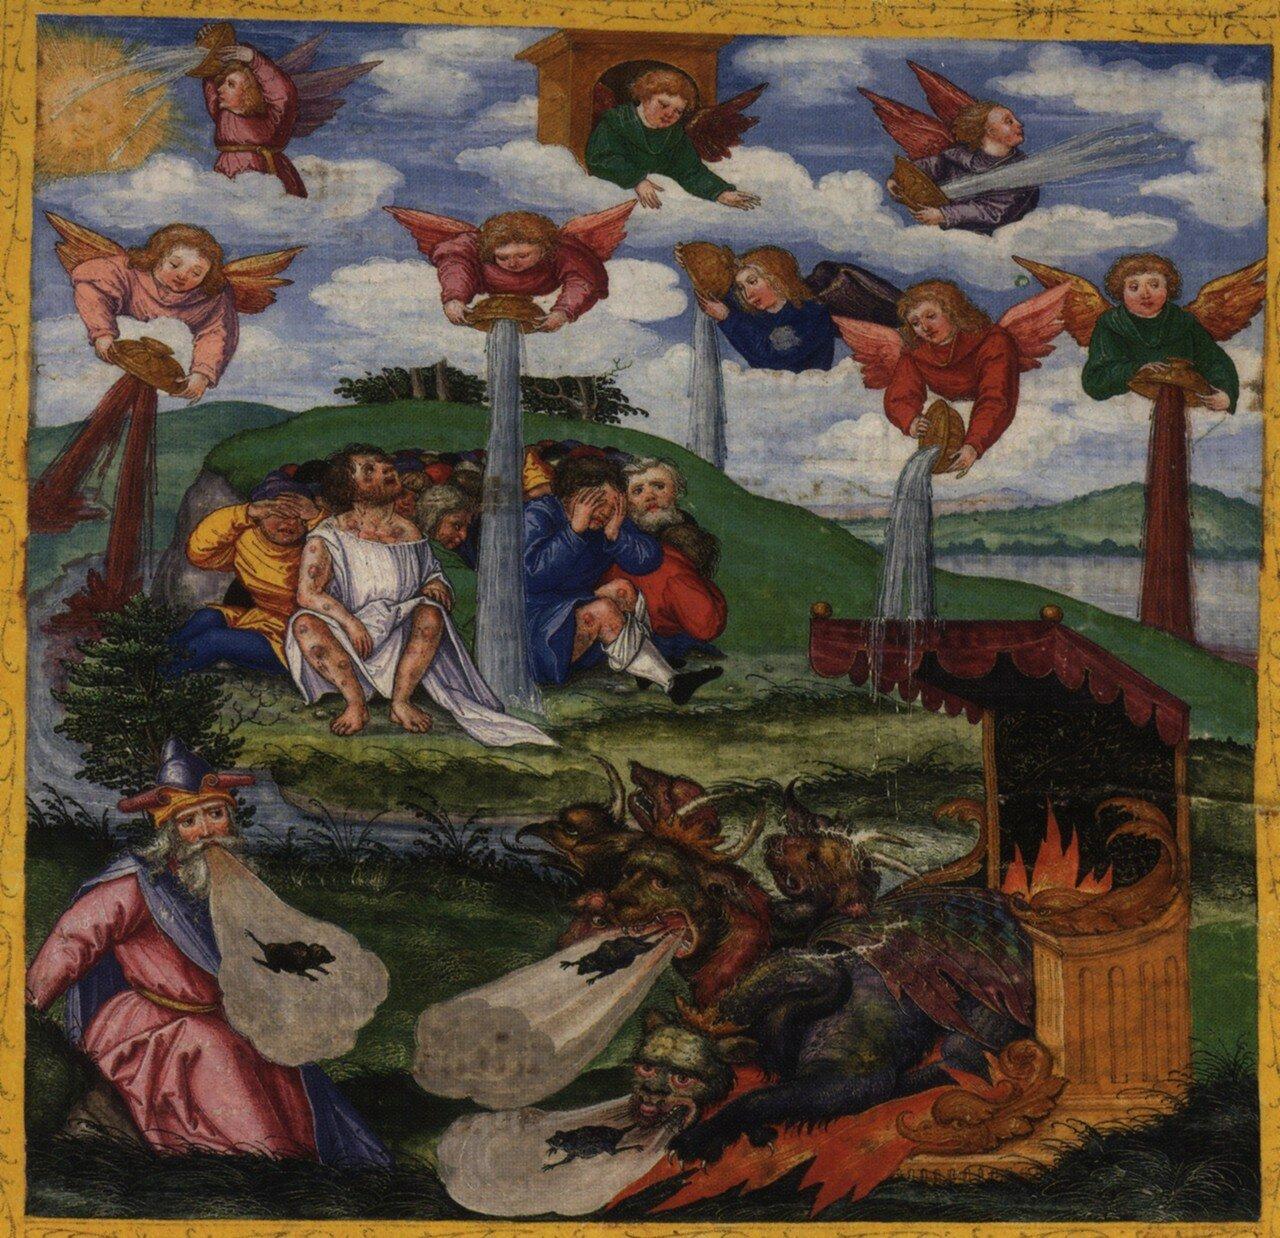 Ottheinrich_Folio298r_Rev16A.jpg